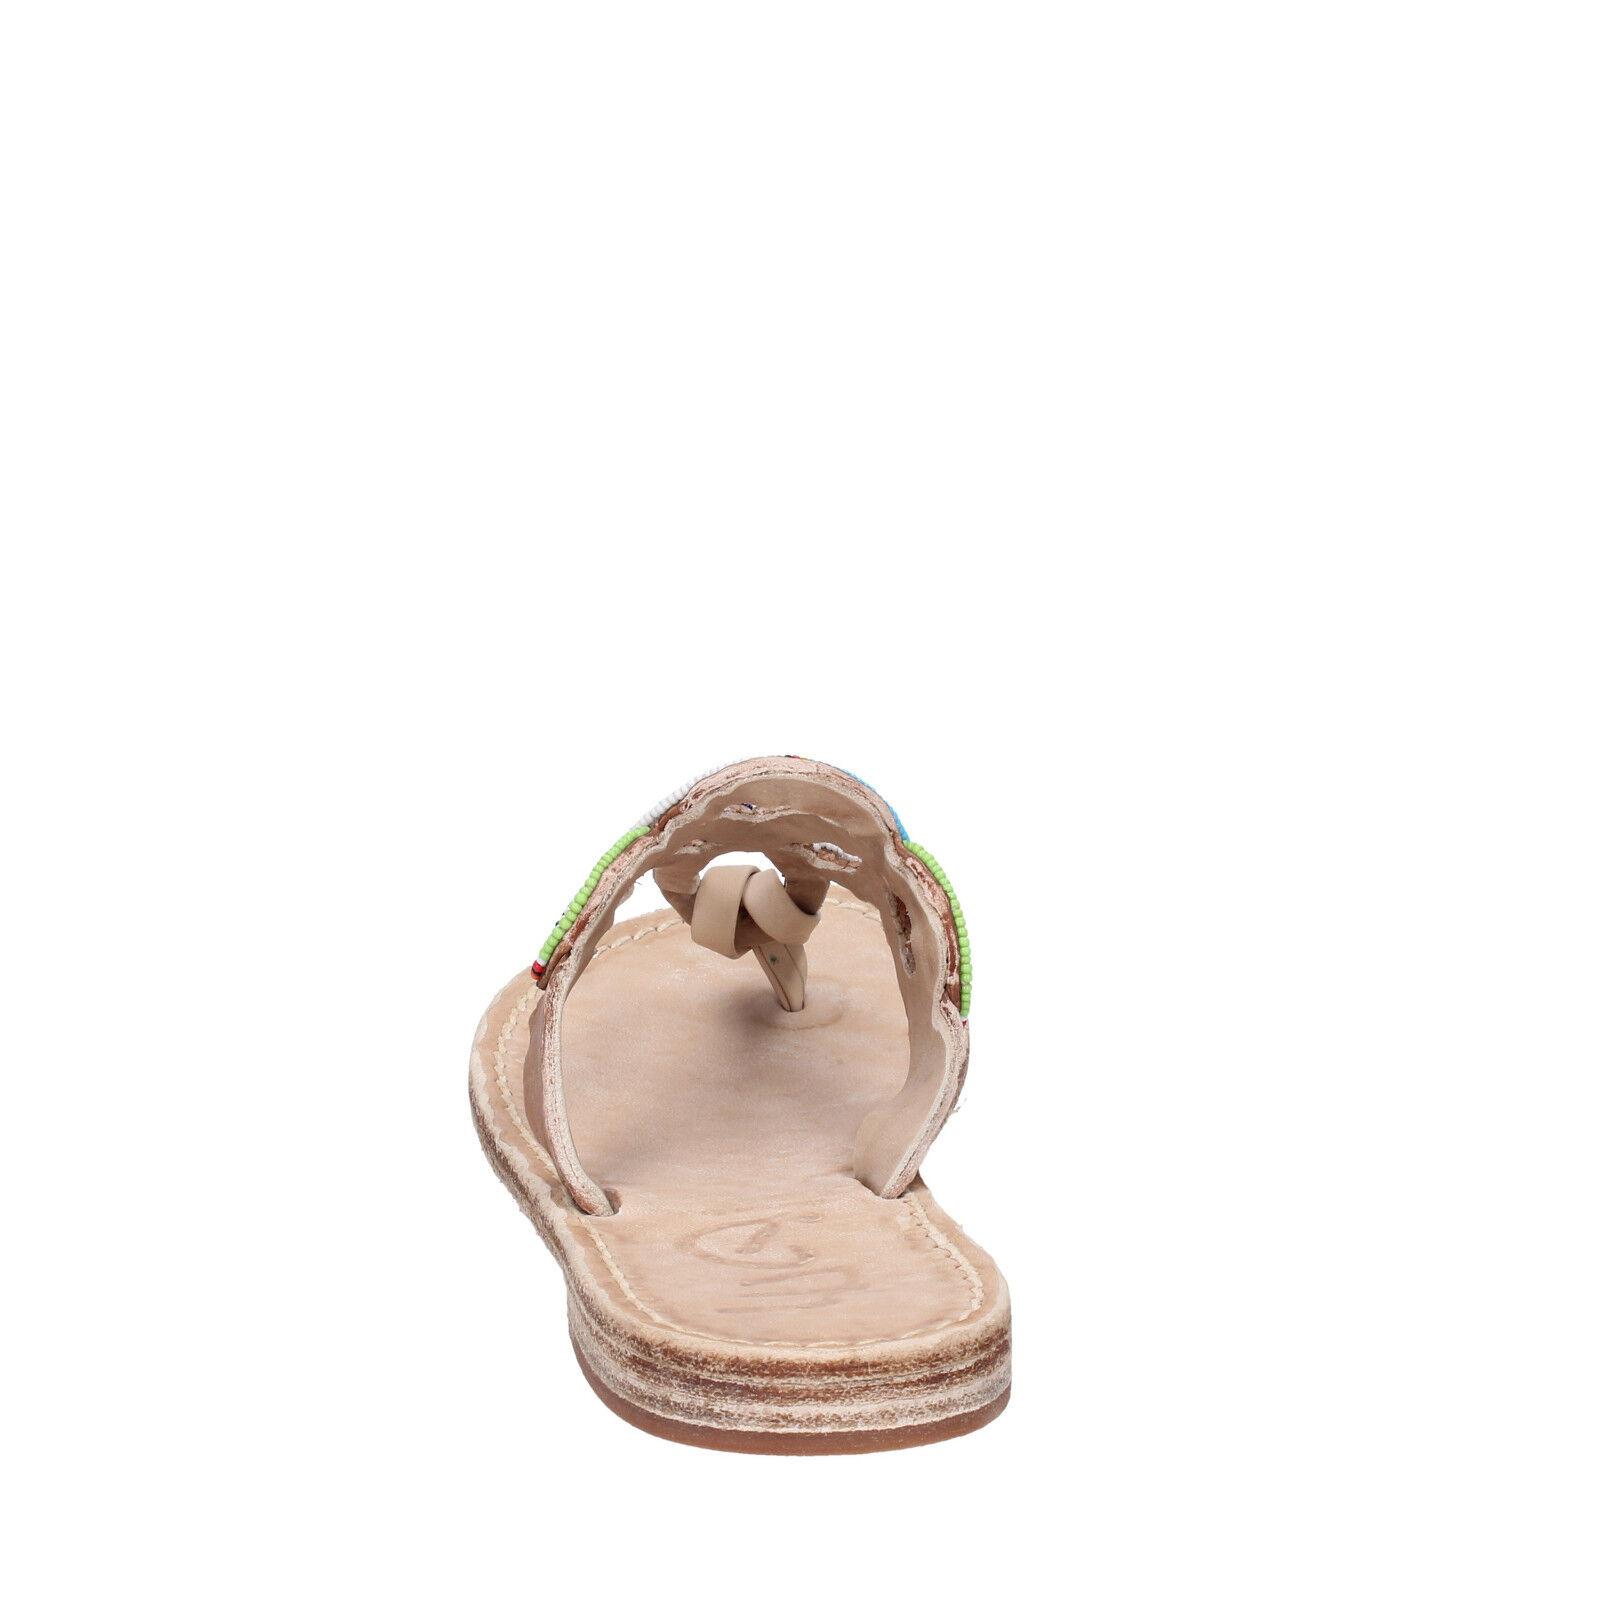 Damen schuhe EDDY perlen DANIELE 37 EU Sandale Mehrfarbig leder perlen EDDY AS83 367f23